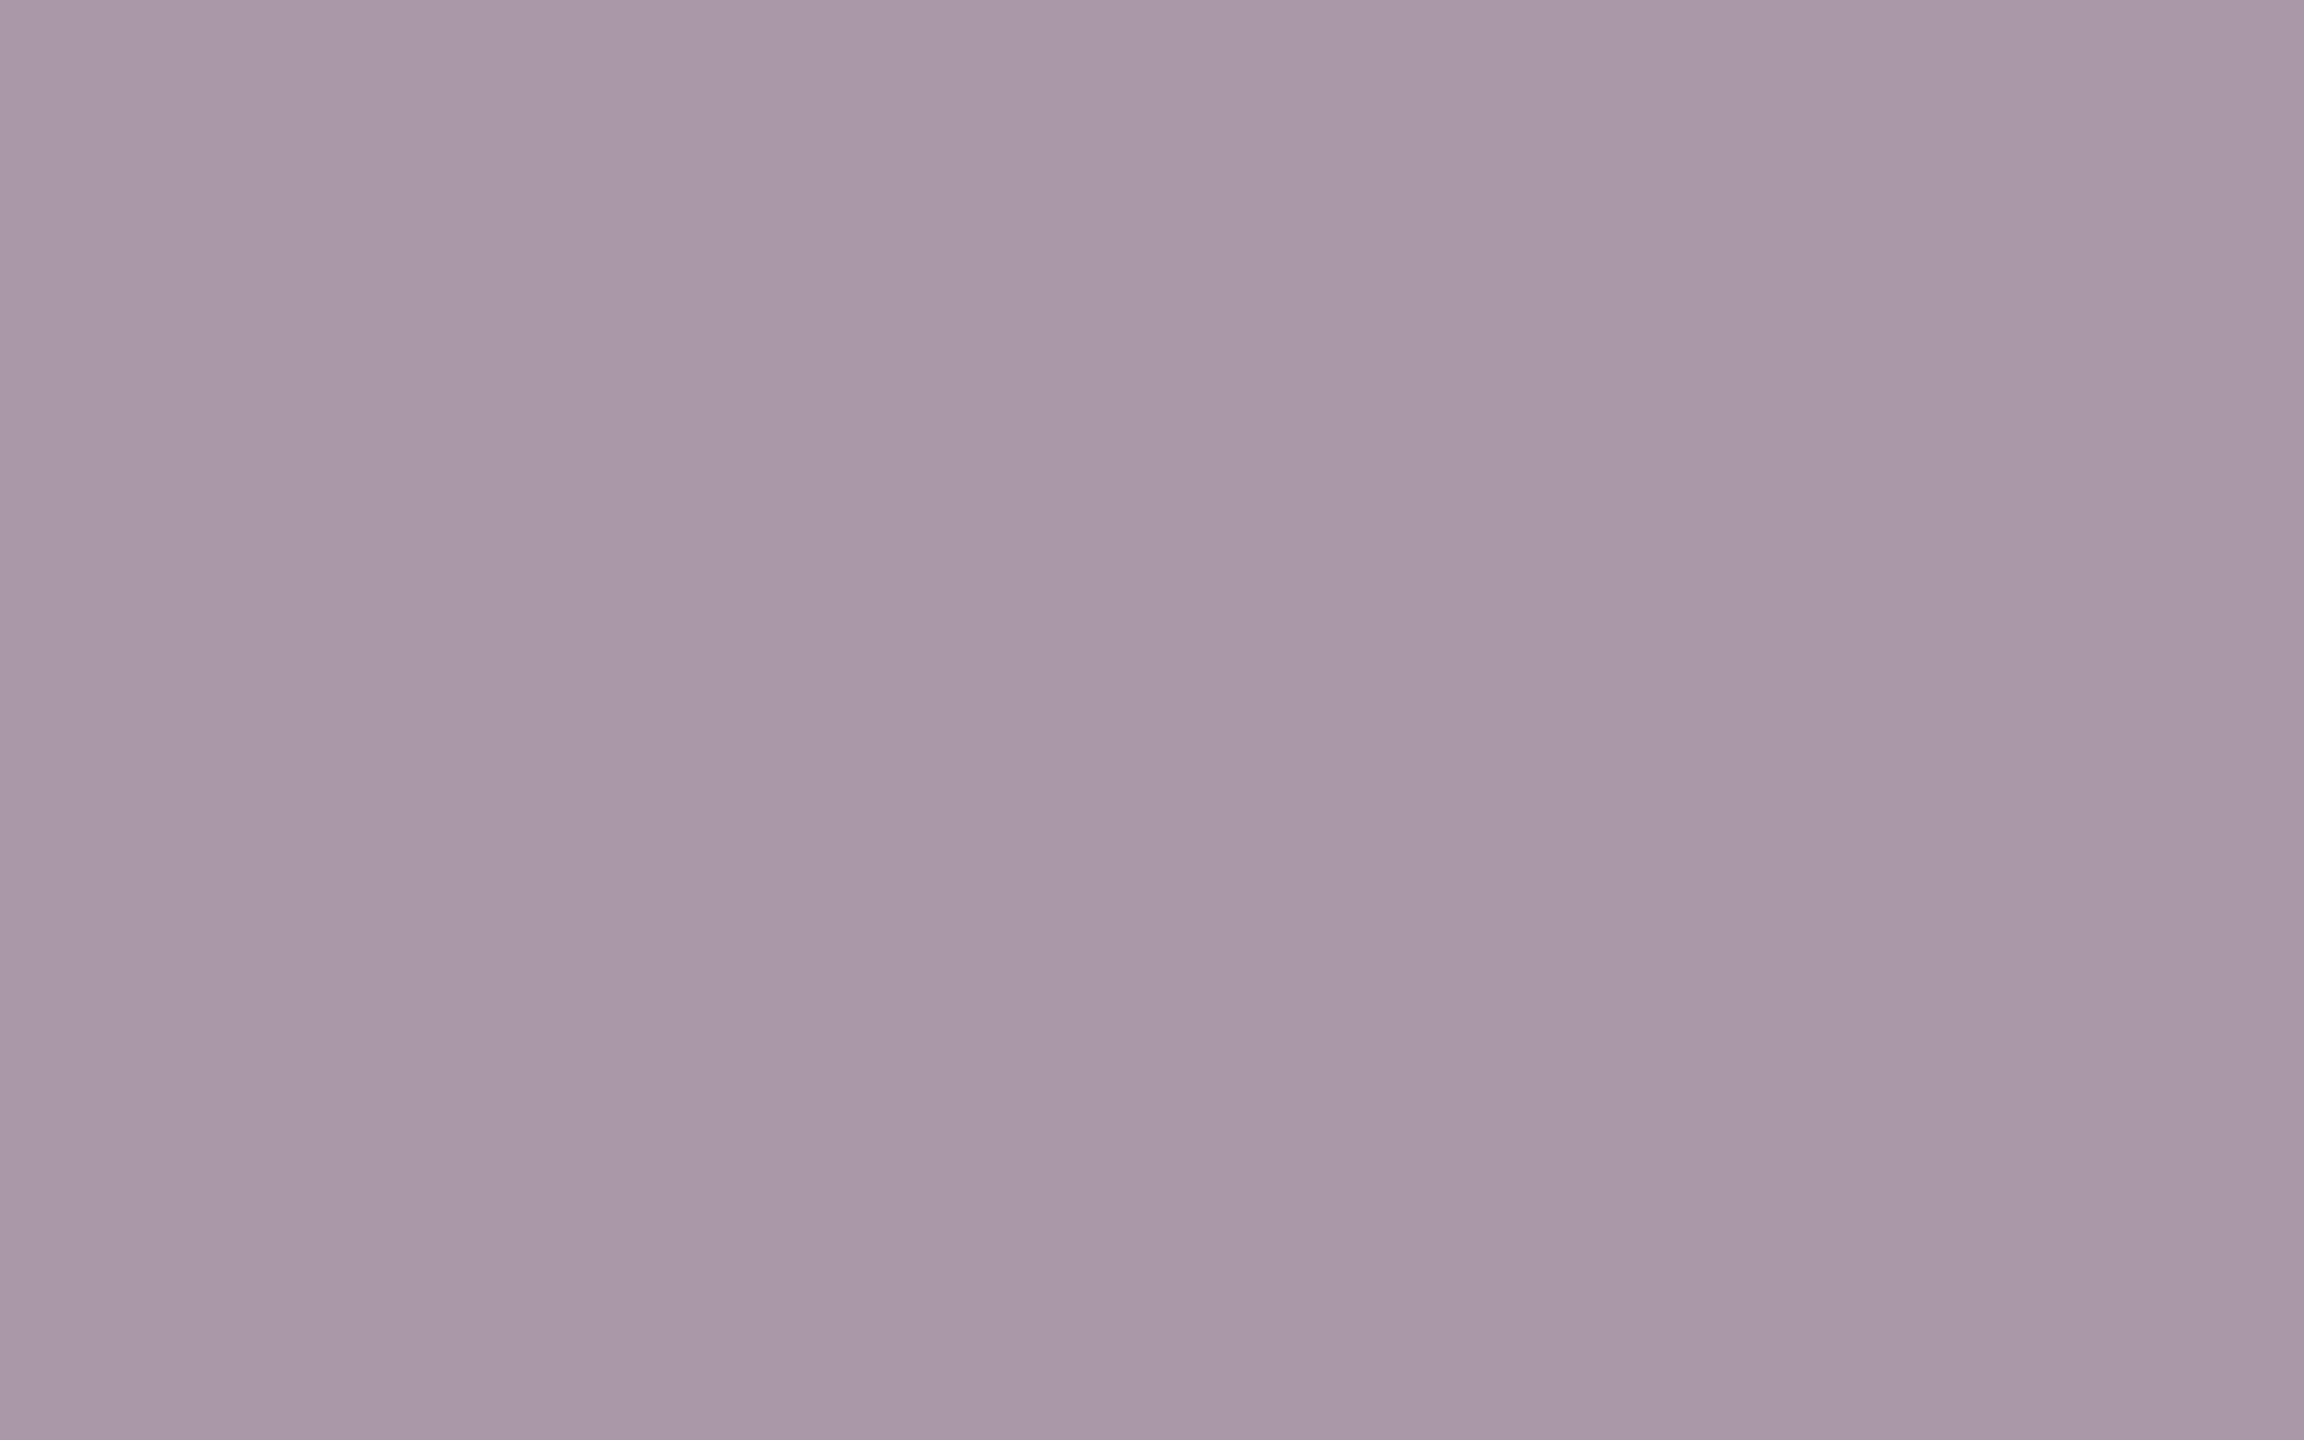 2304x1440 Rose Quartz Solid Color Background